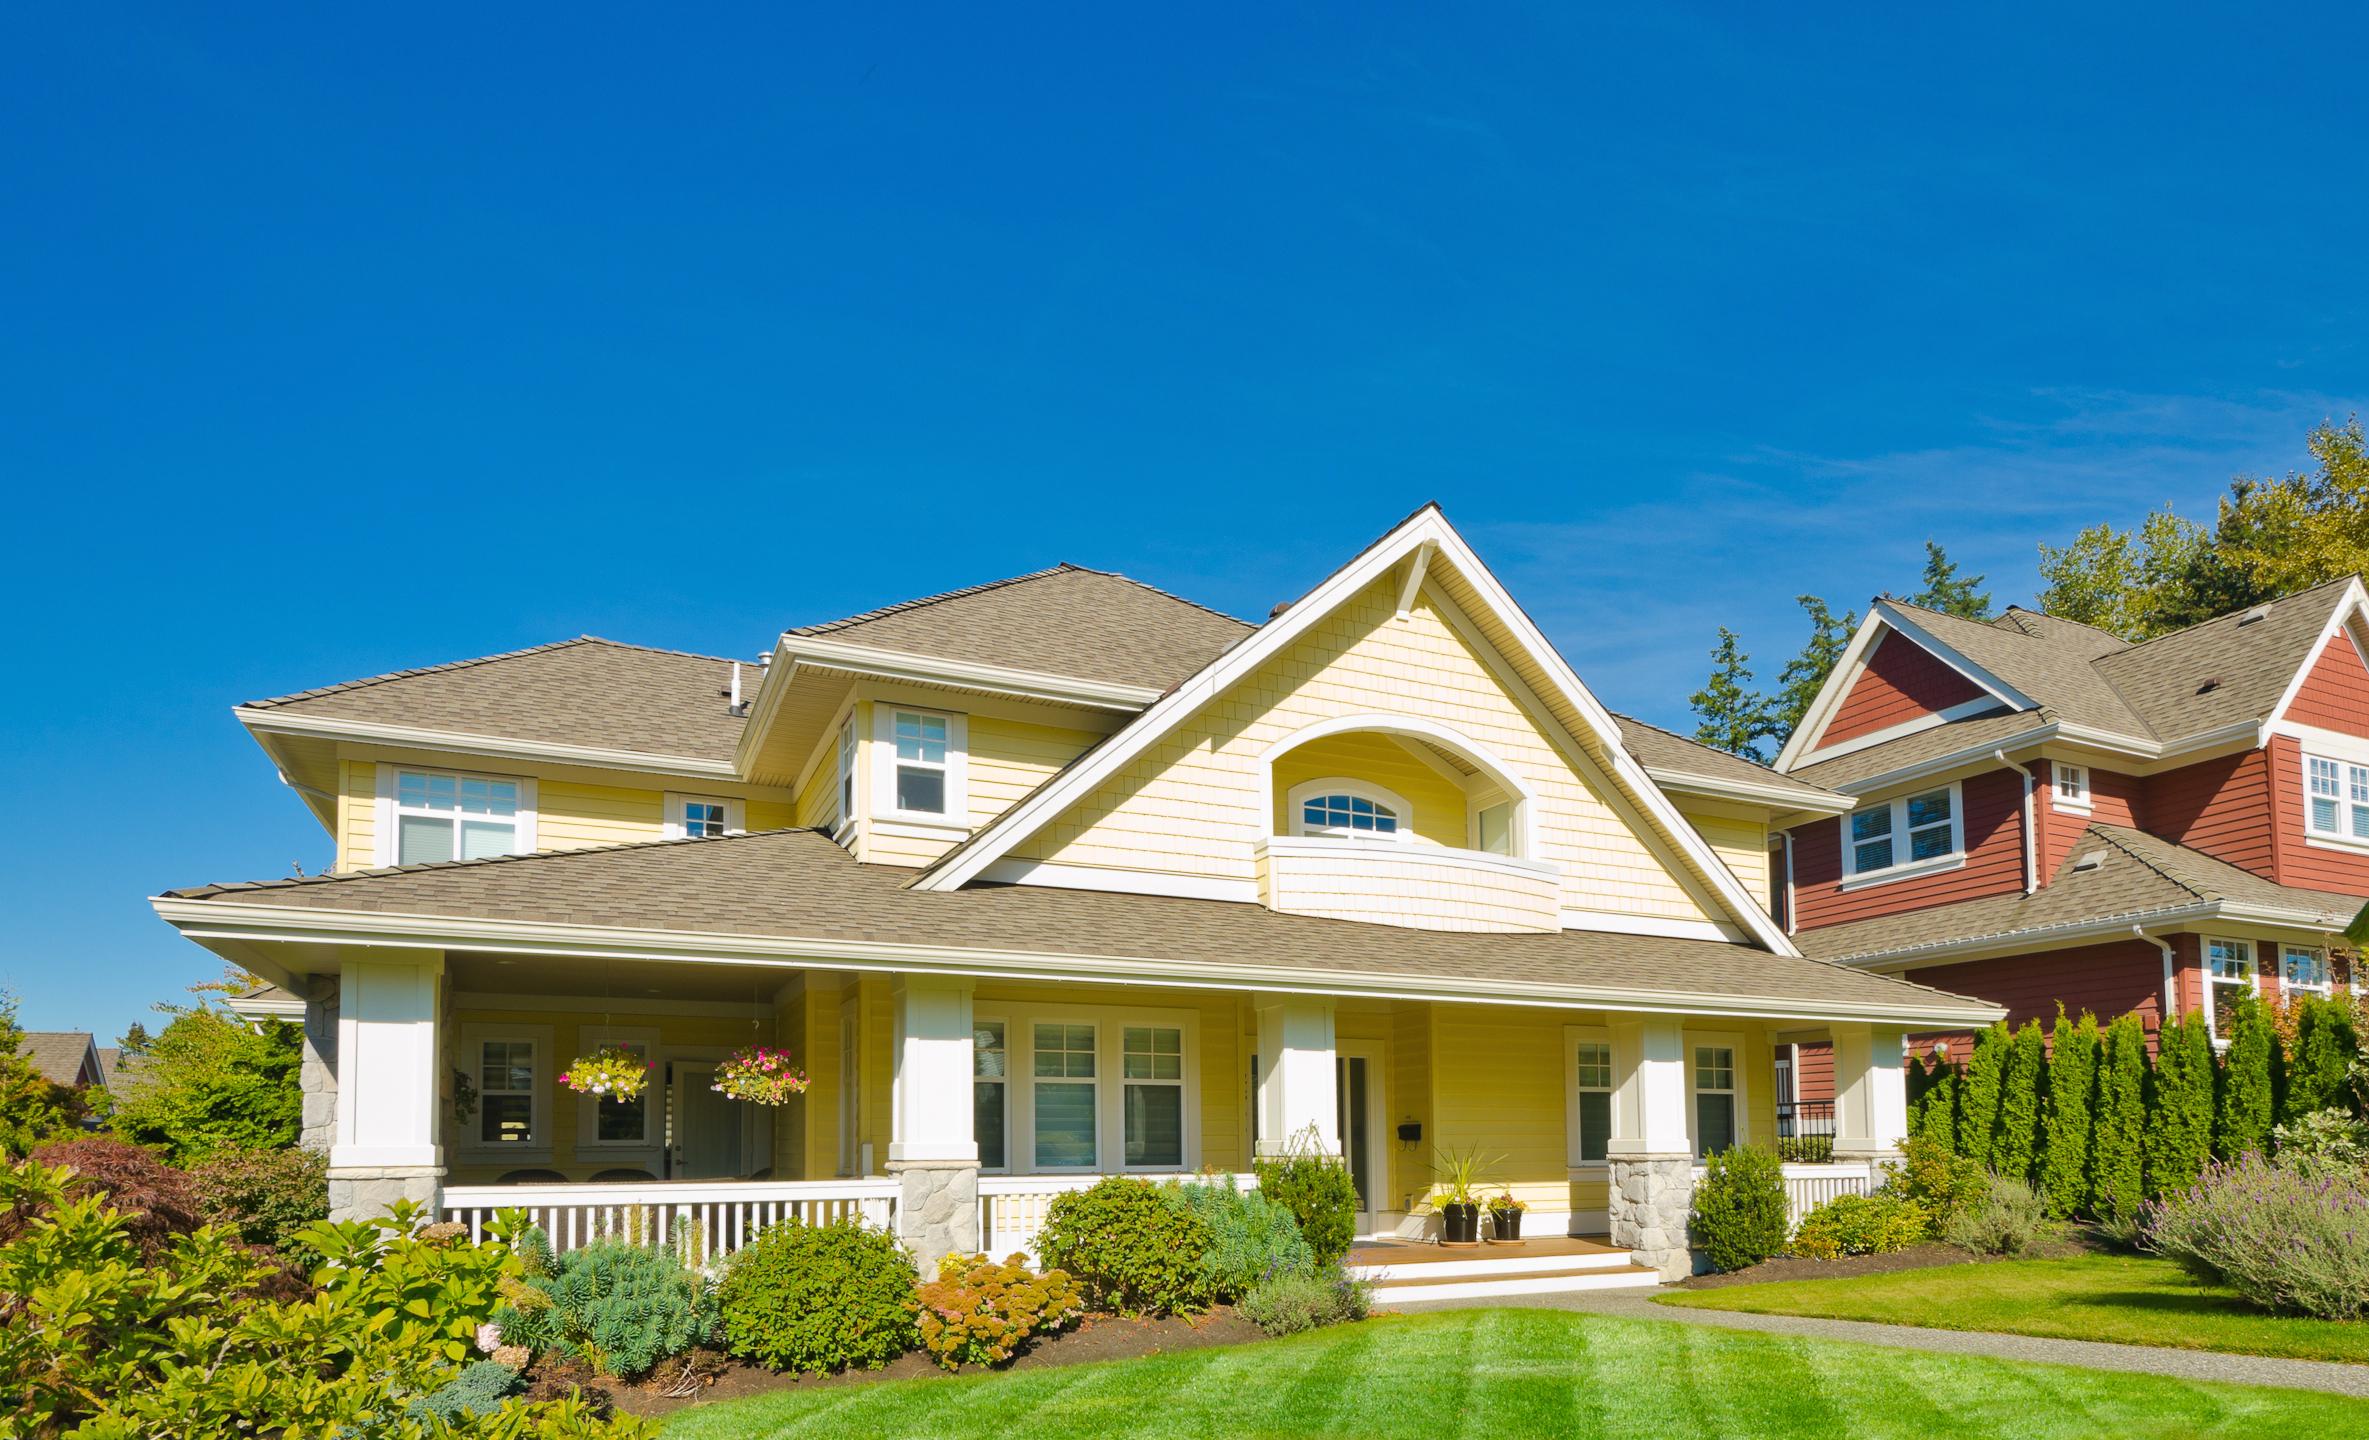 Homes For Sale Eaton Colorado